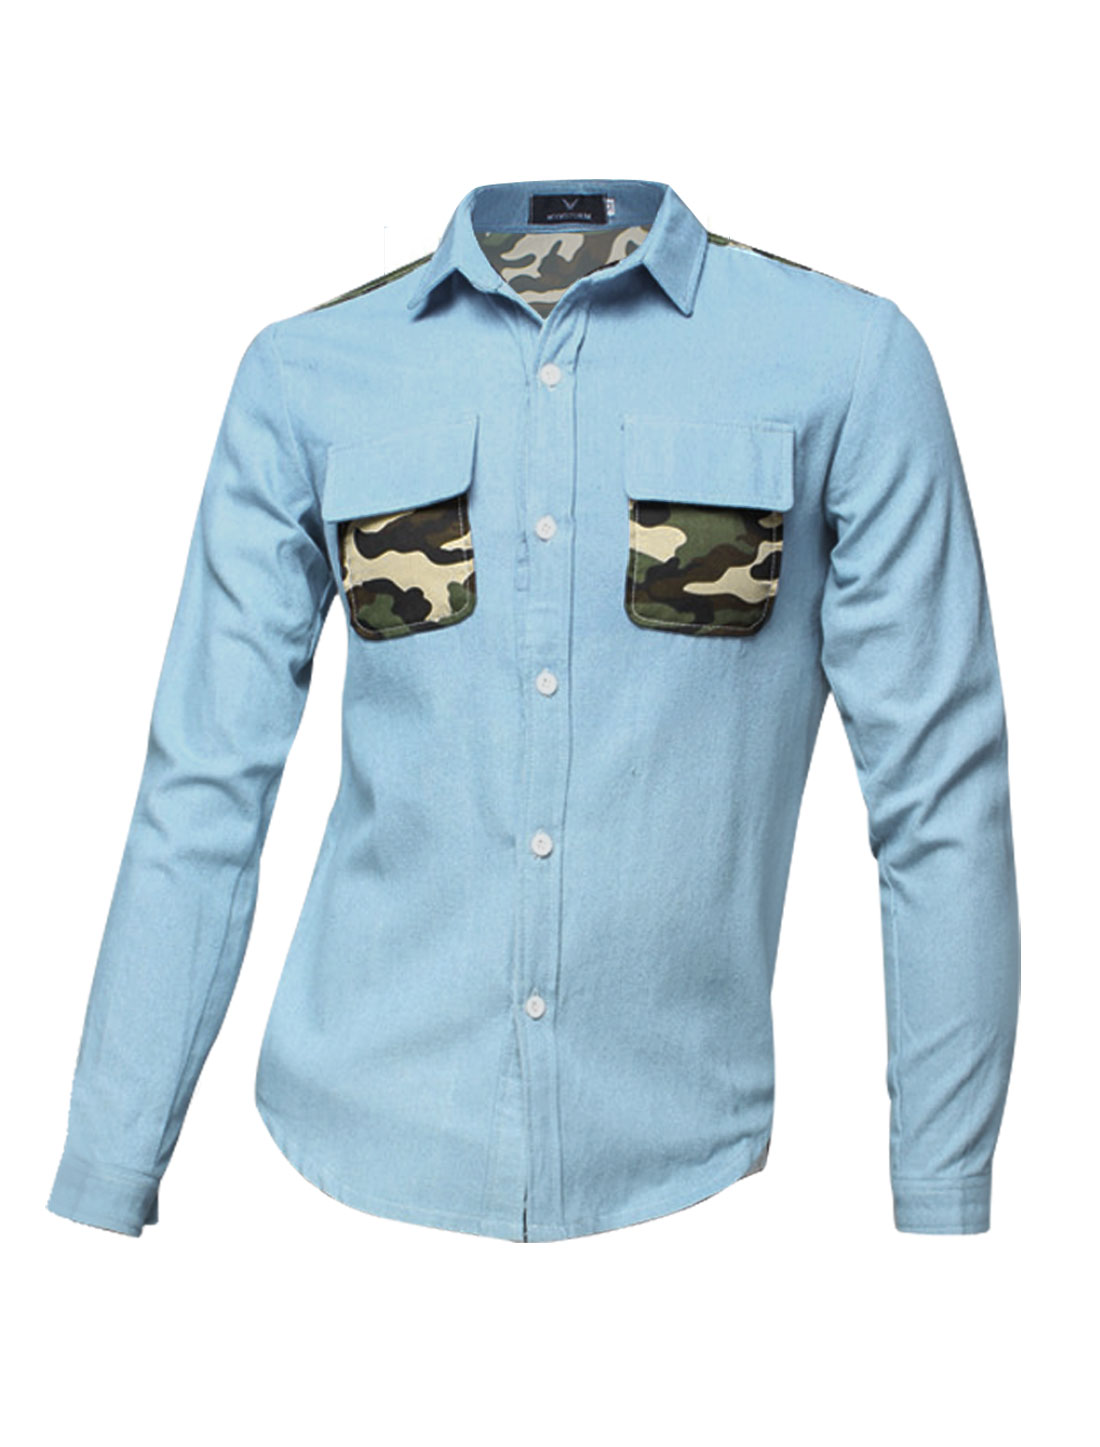 Men Long Sleeves Camouflage Pattern Button Down Denim Shirts Light Blue S